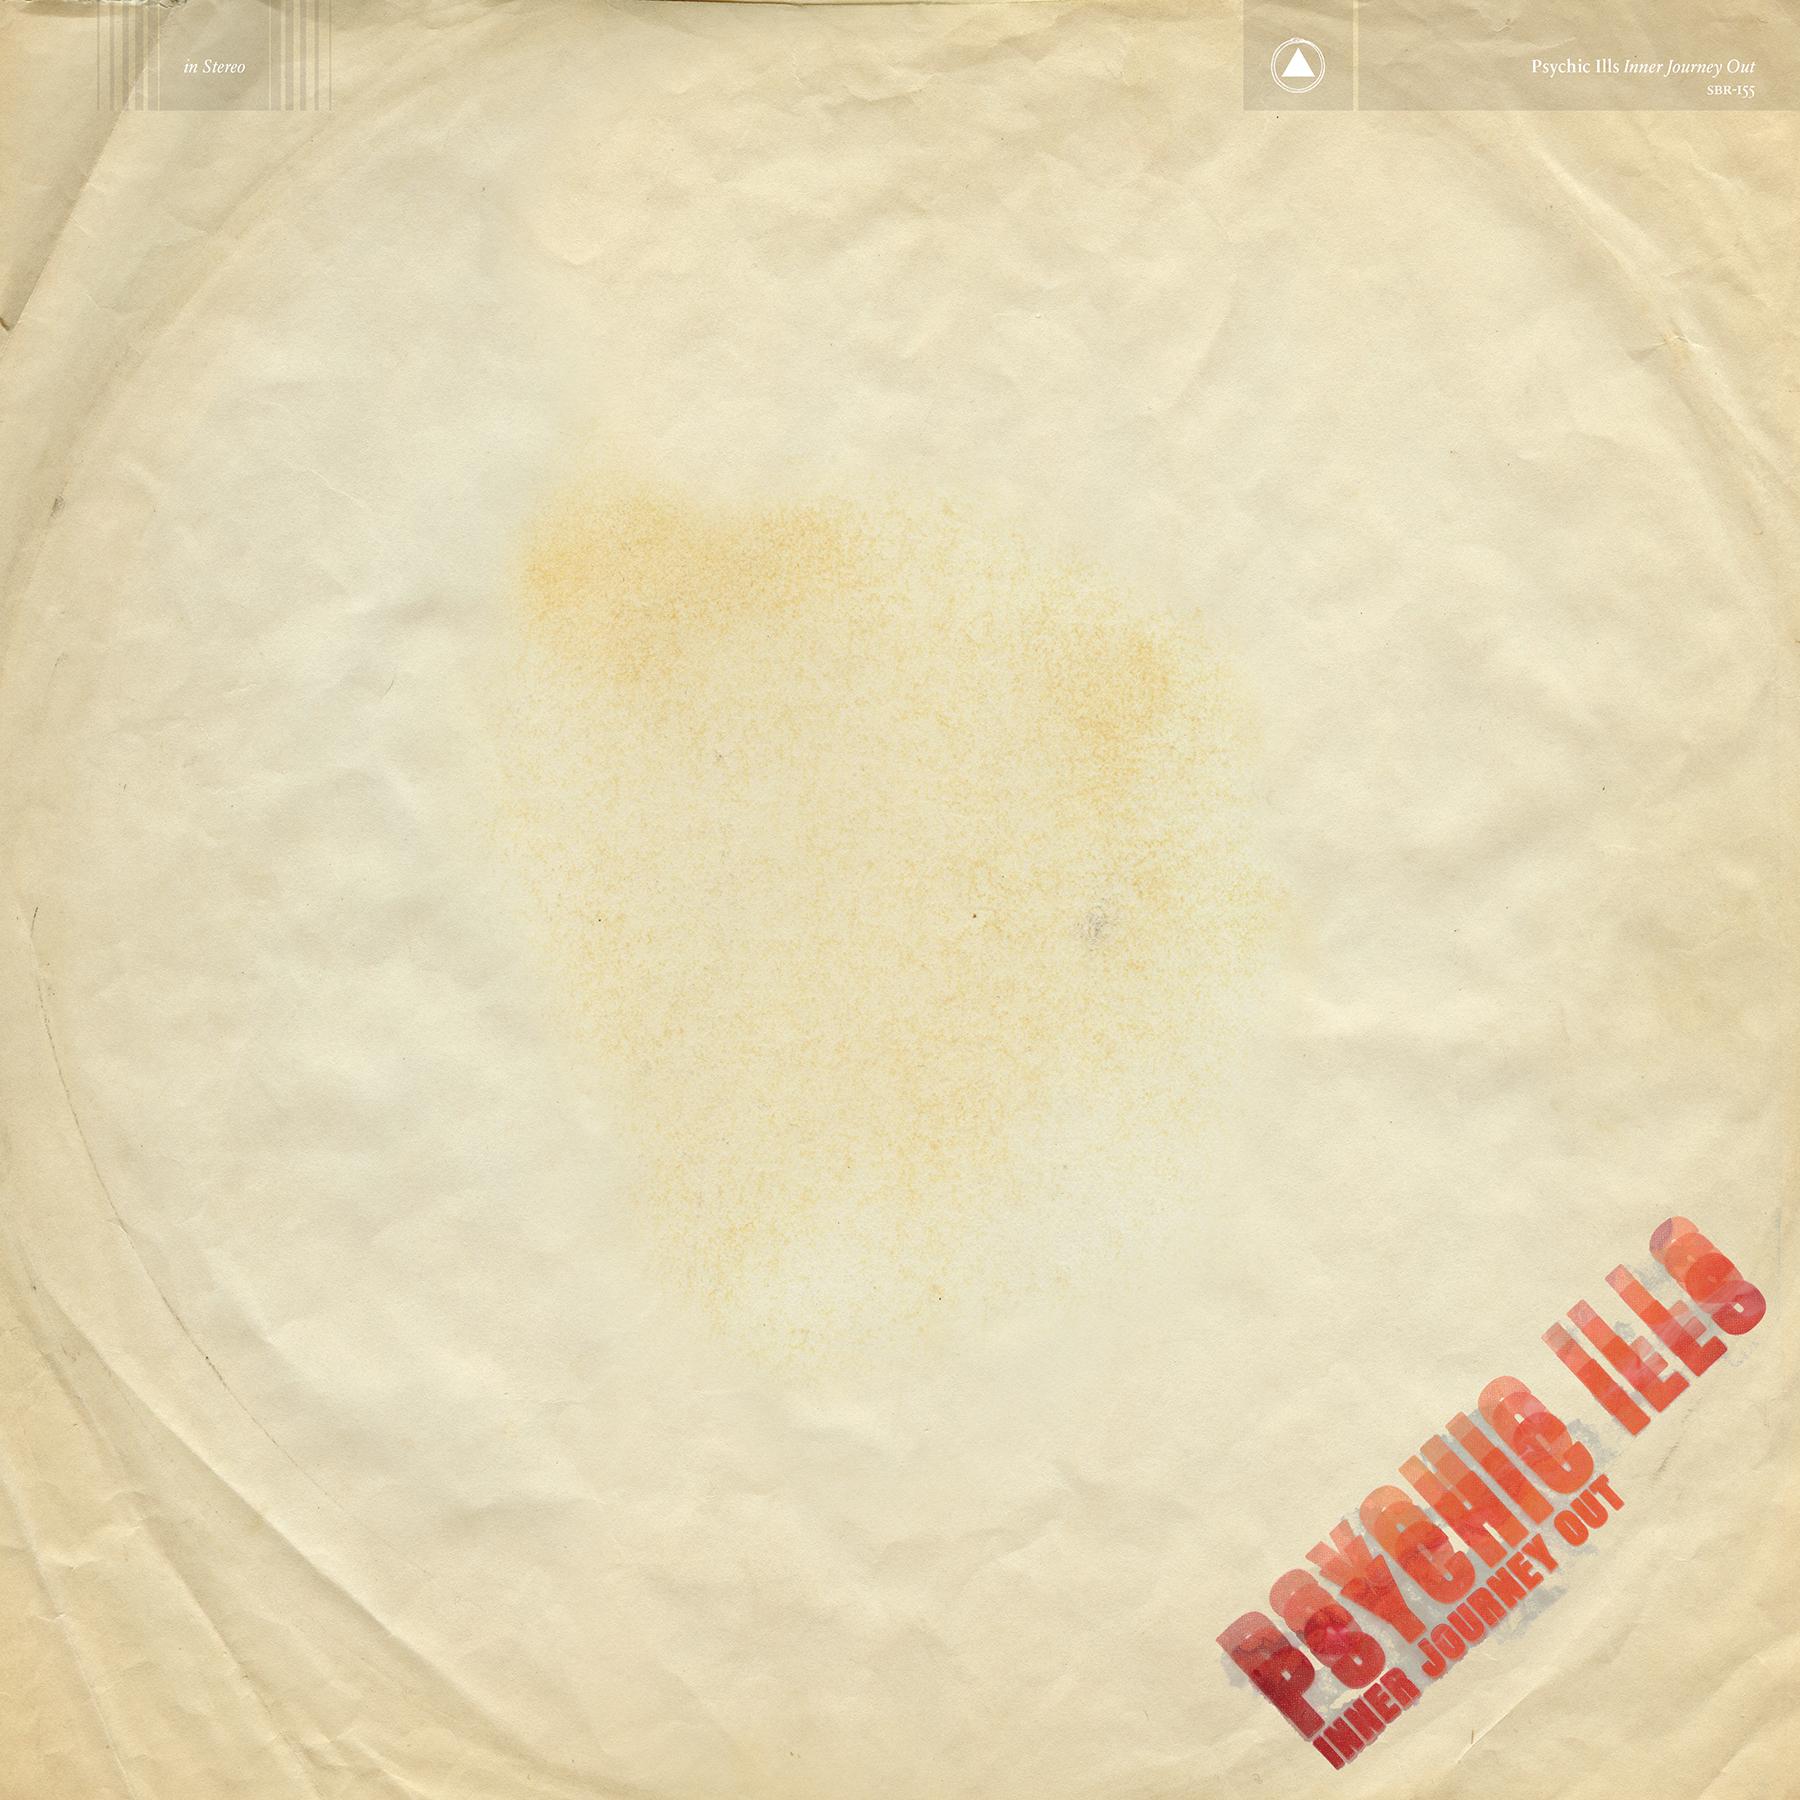 sbr155 psychicills 300 Stream: Psychic Ills' new album Inner Journey Out